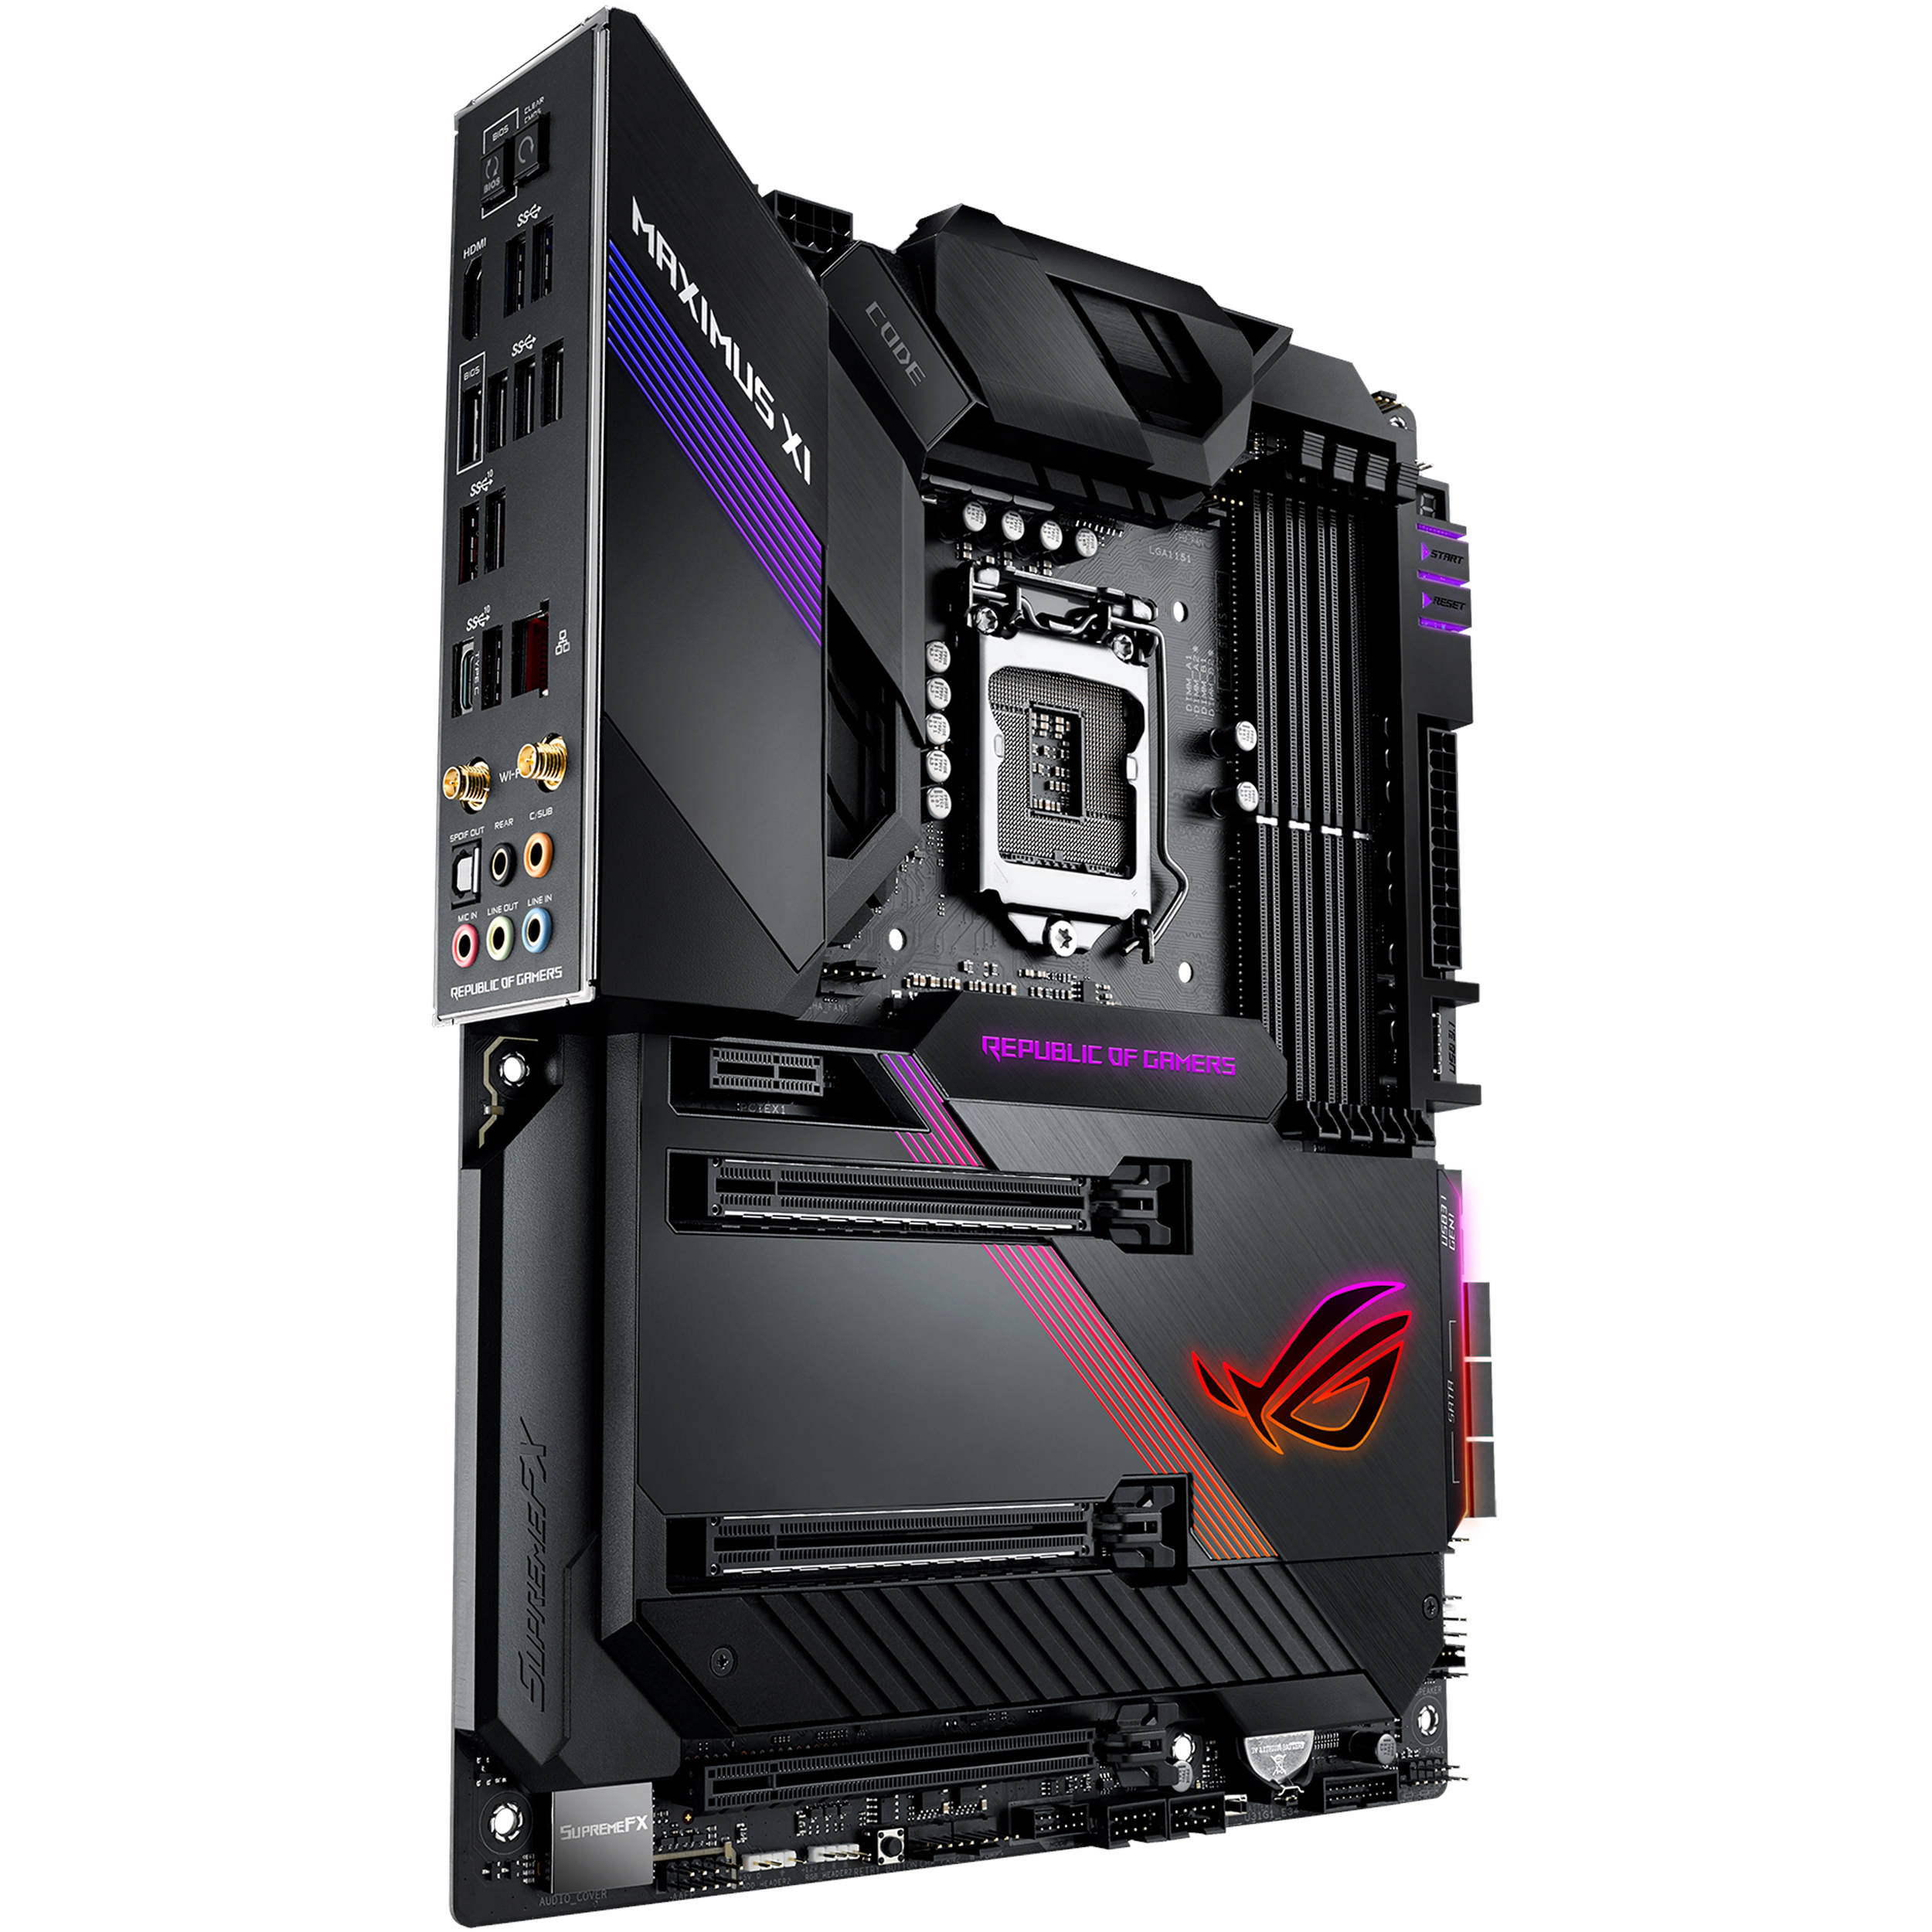 ASUS Republic of Gamers Maximus XI Code LGA 1151 ATX Motherboard